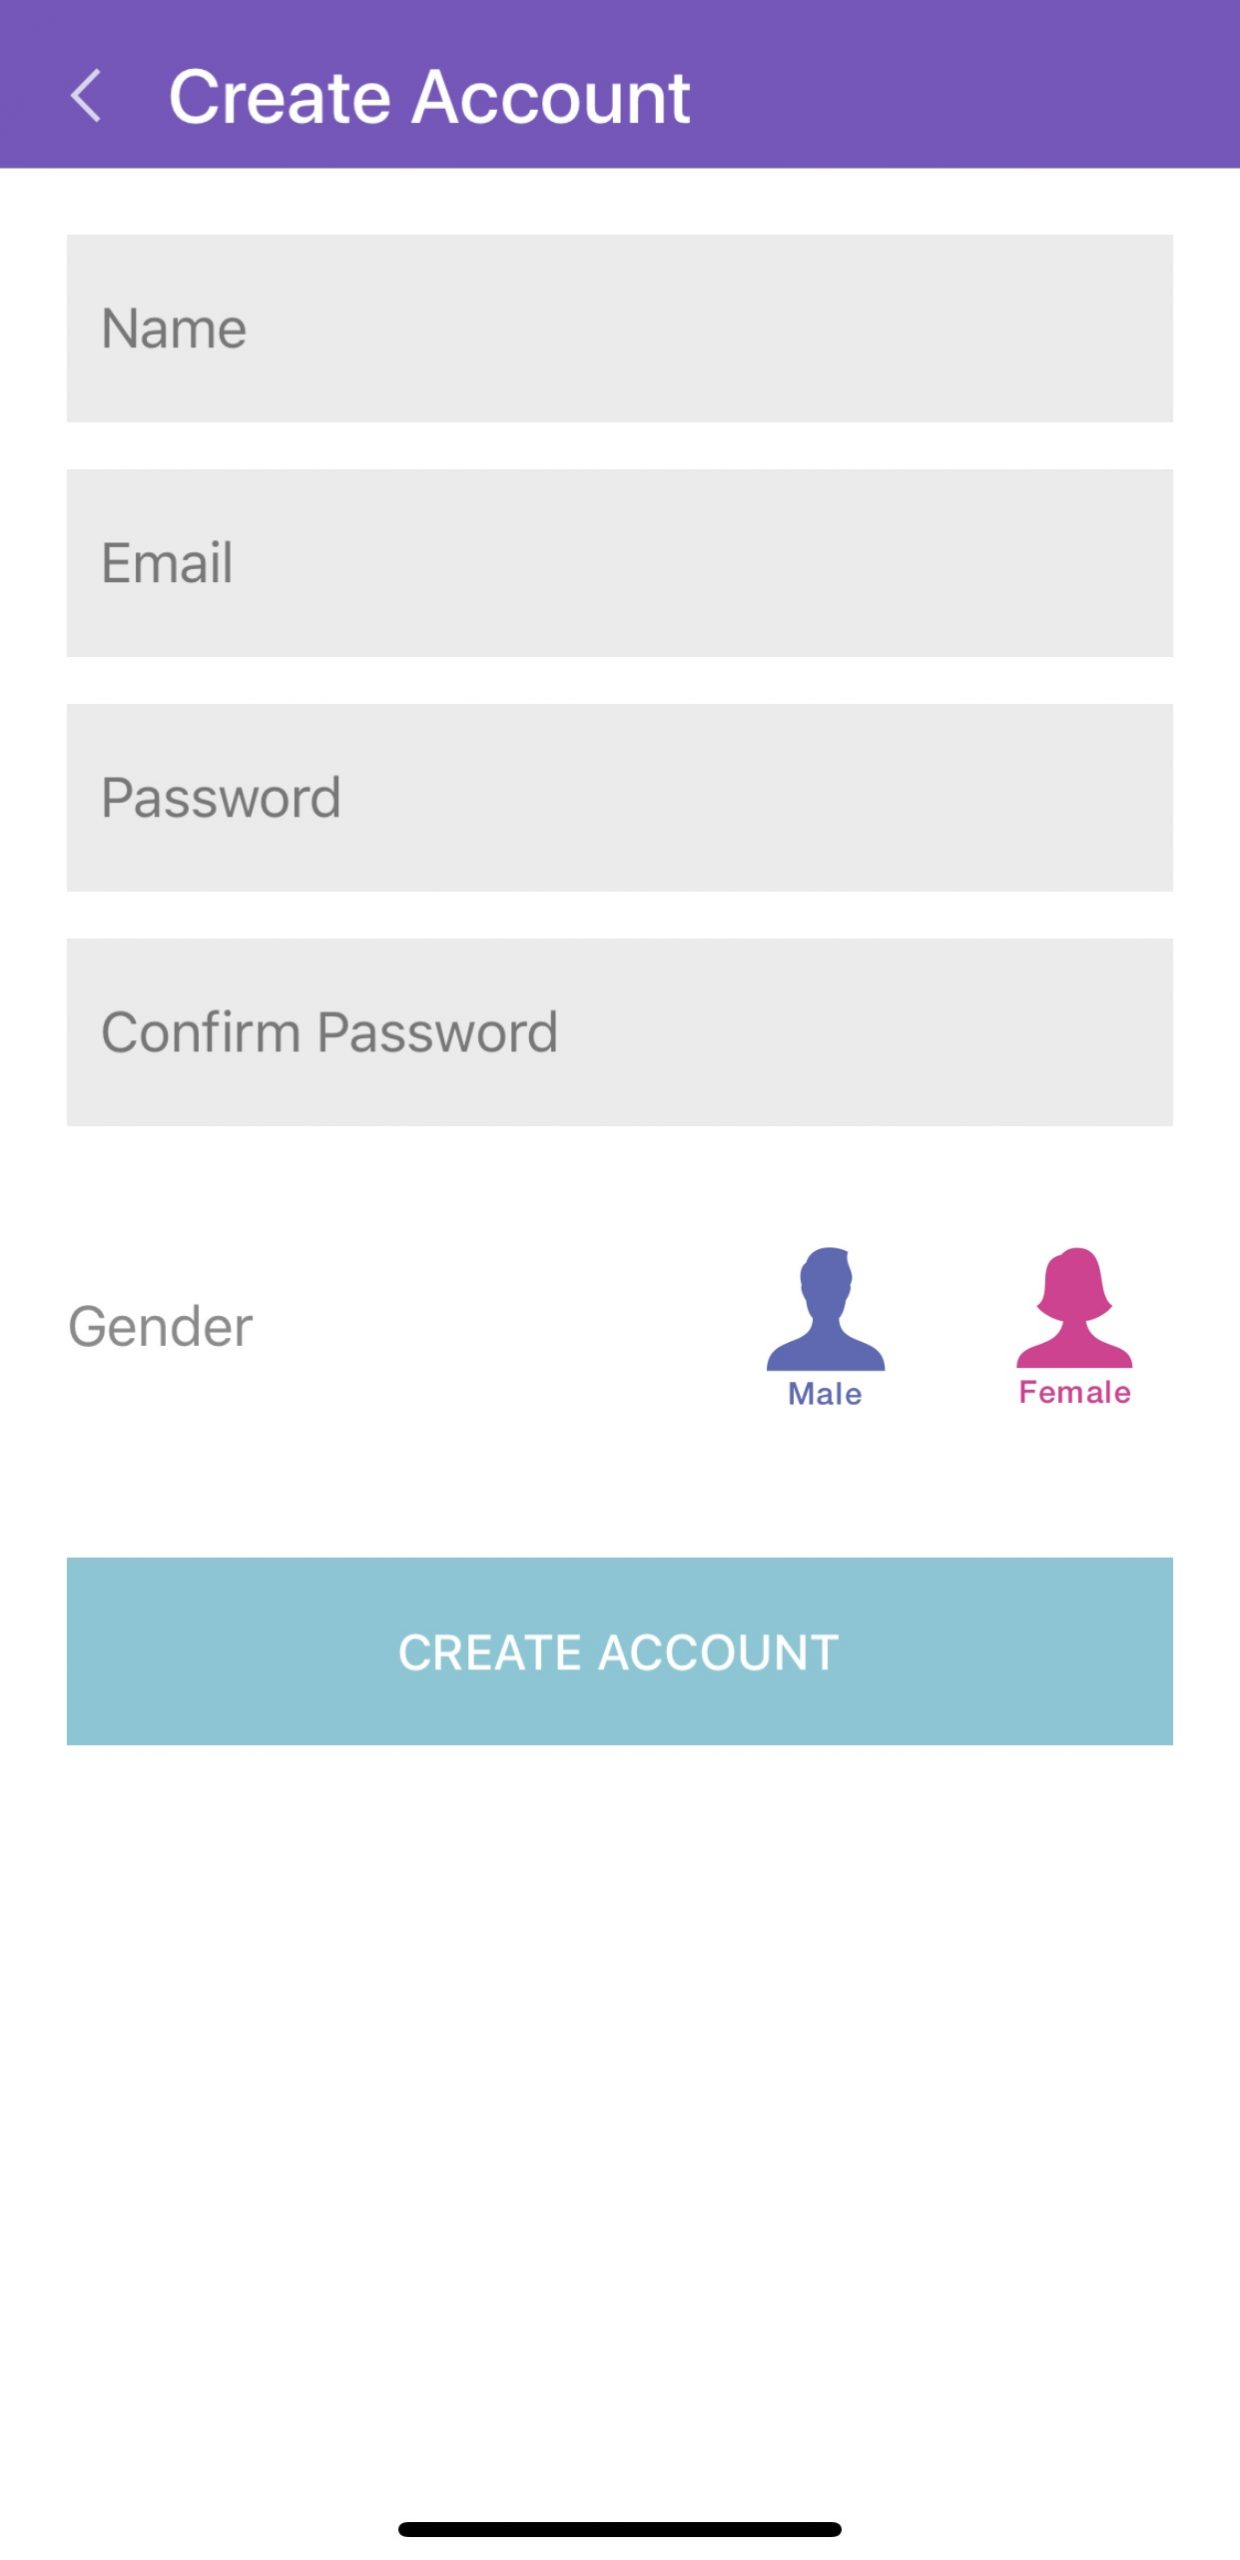 MyPsychic App account creation